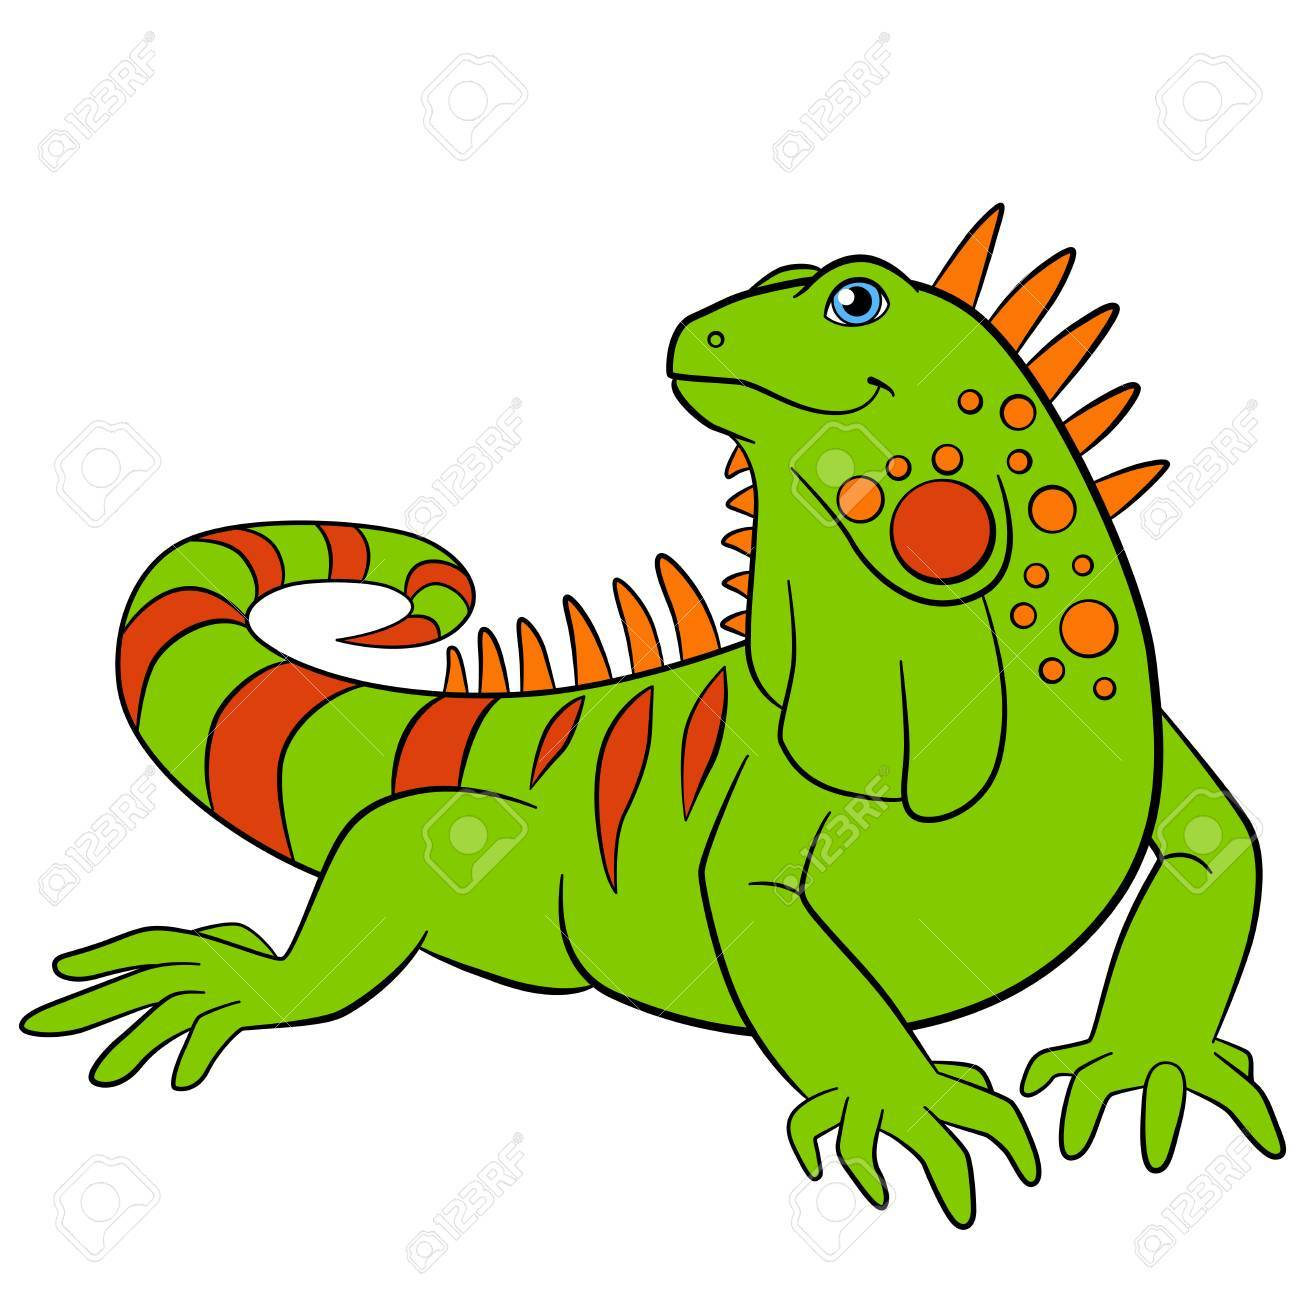 Cartoon animals. Cute green iguana smiles. » Clipart Station.